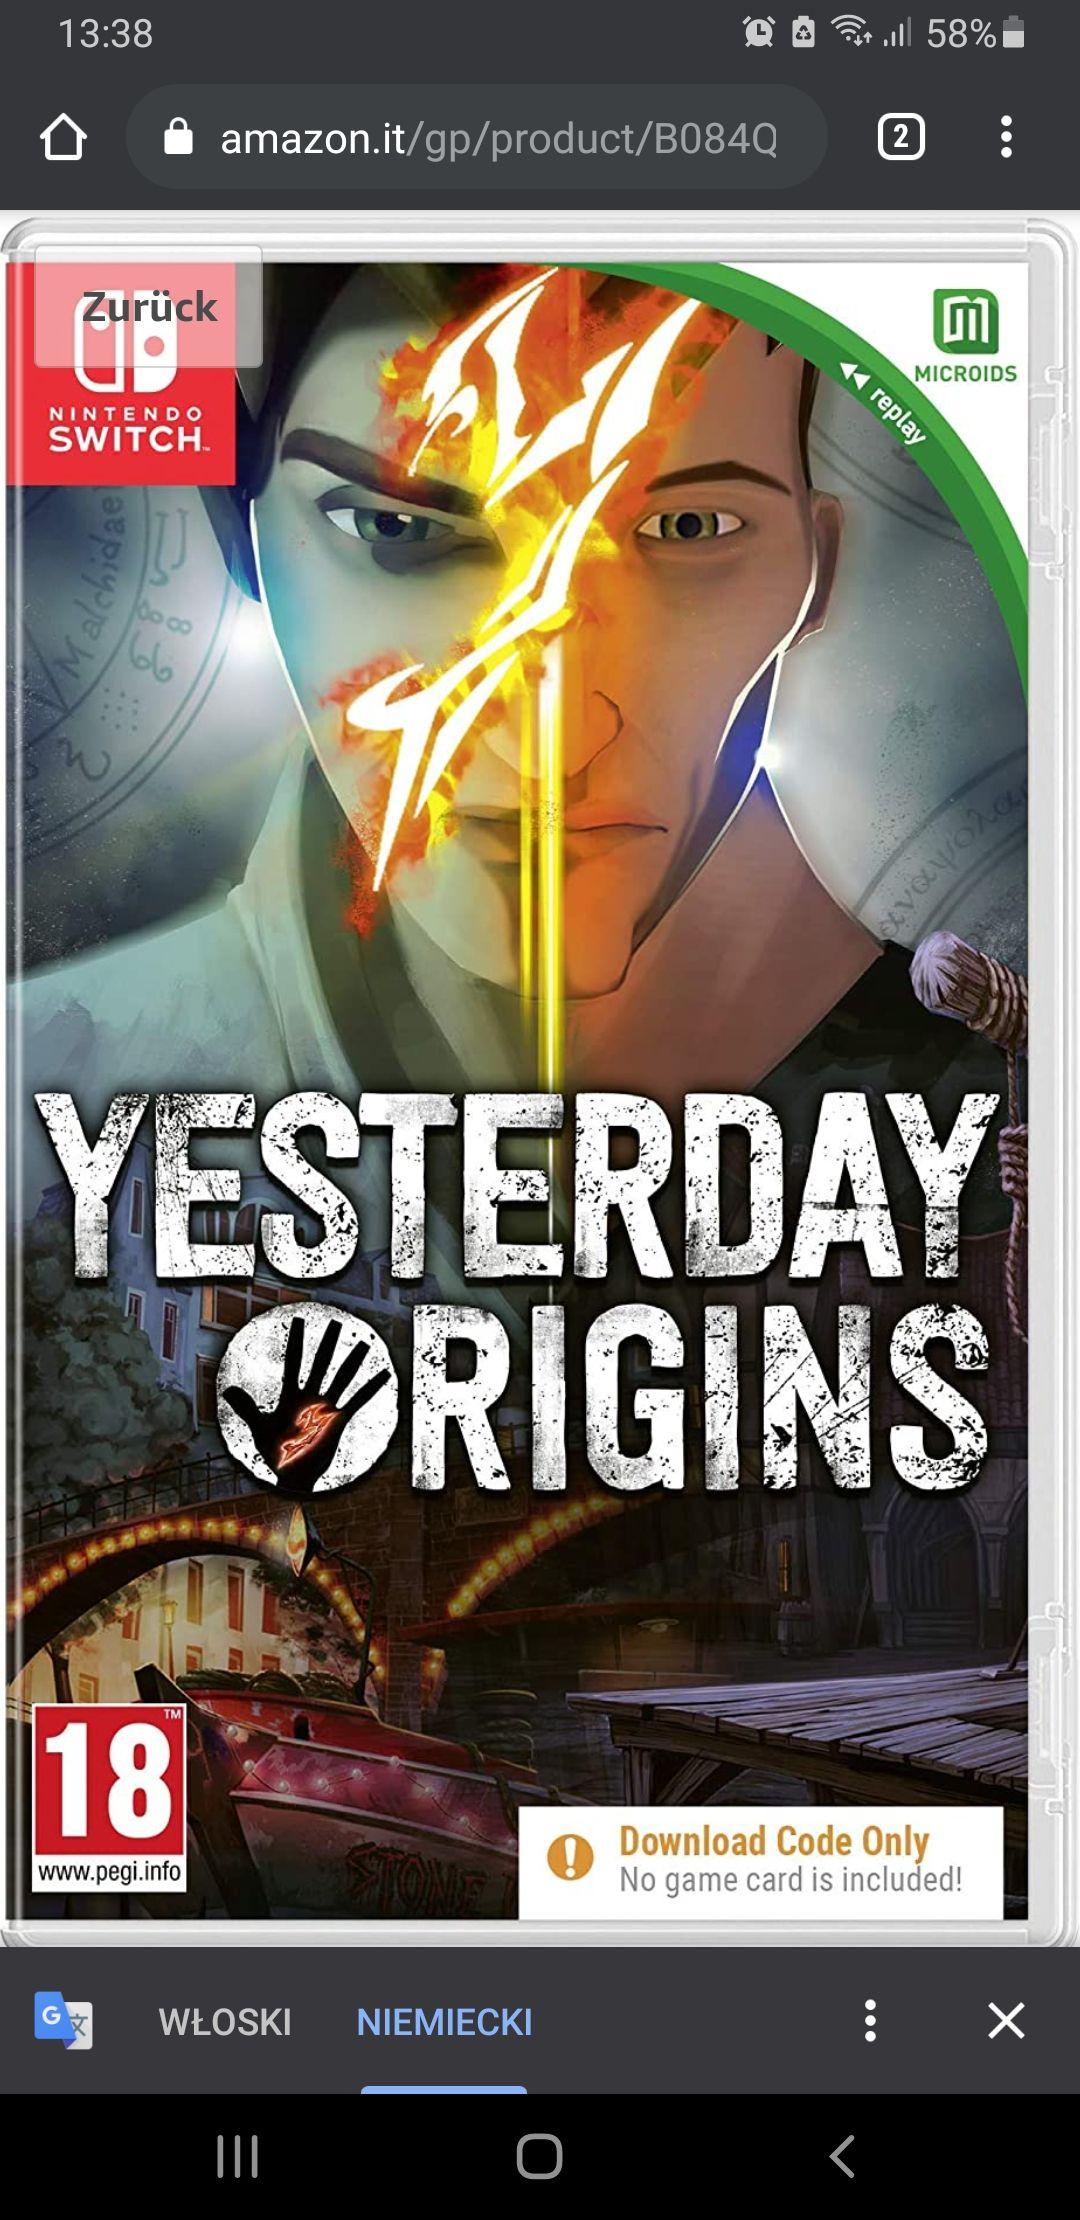 Yesterday OriginsNintendo Switch